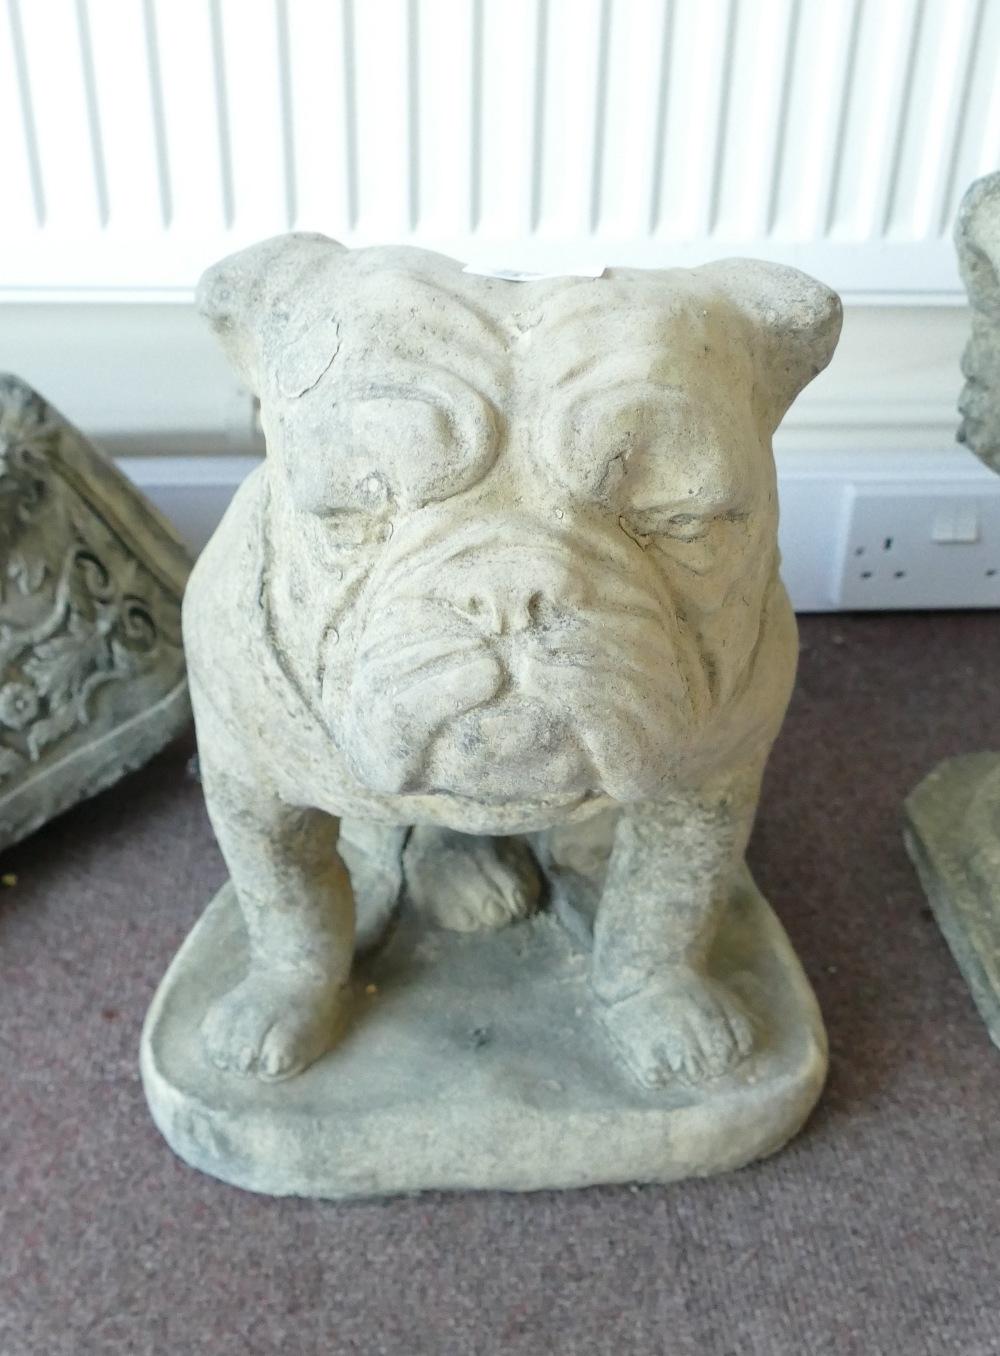 Devonshire Stone model of seated Bulldog, h40cm: